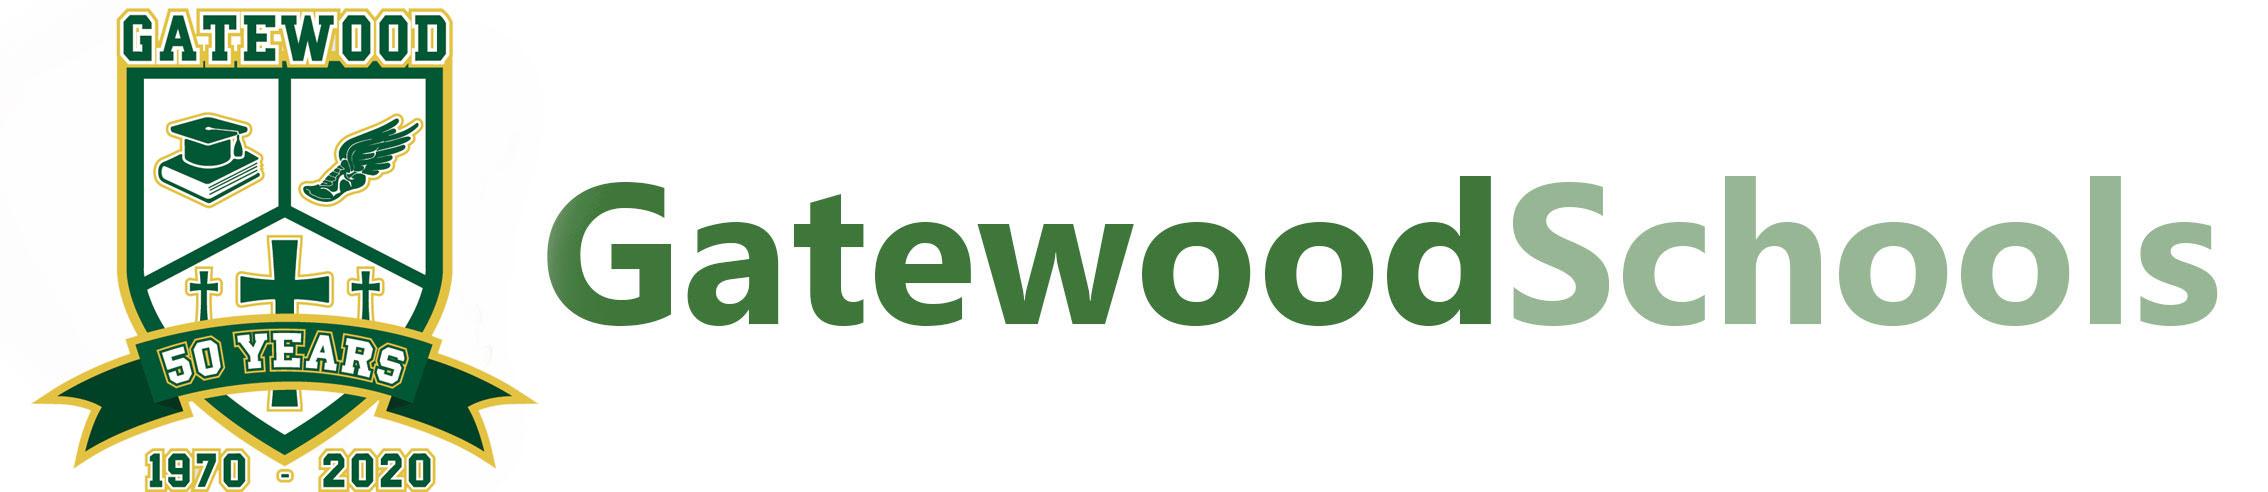 Gatewood Schools, Inc.